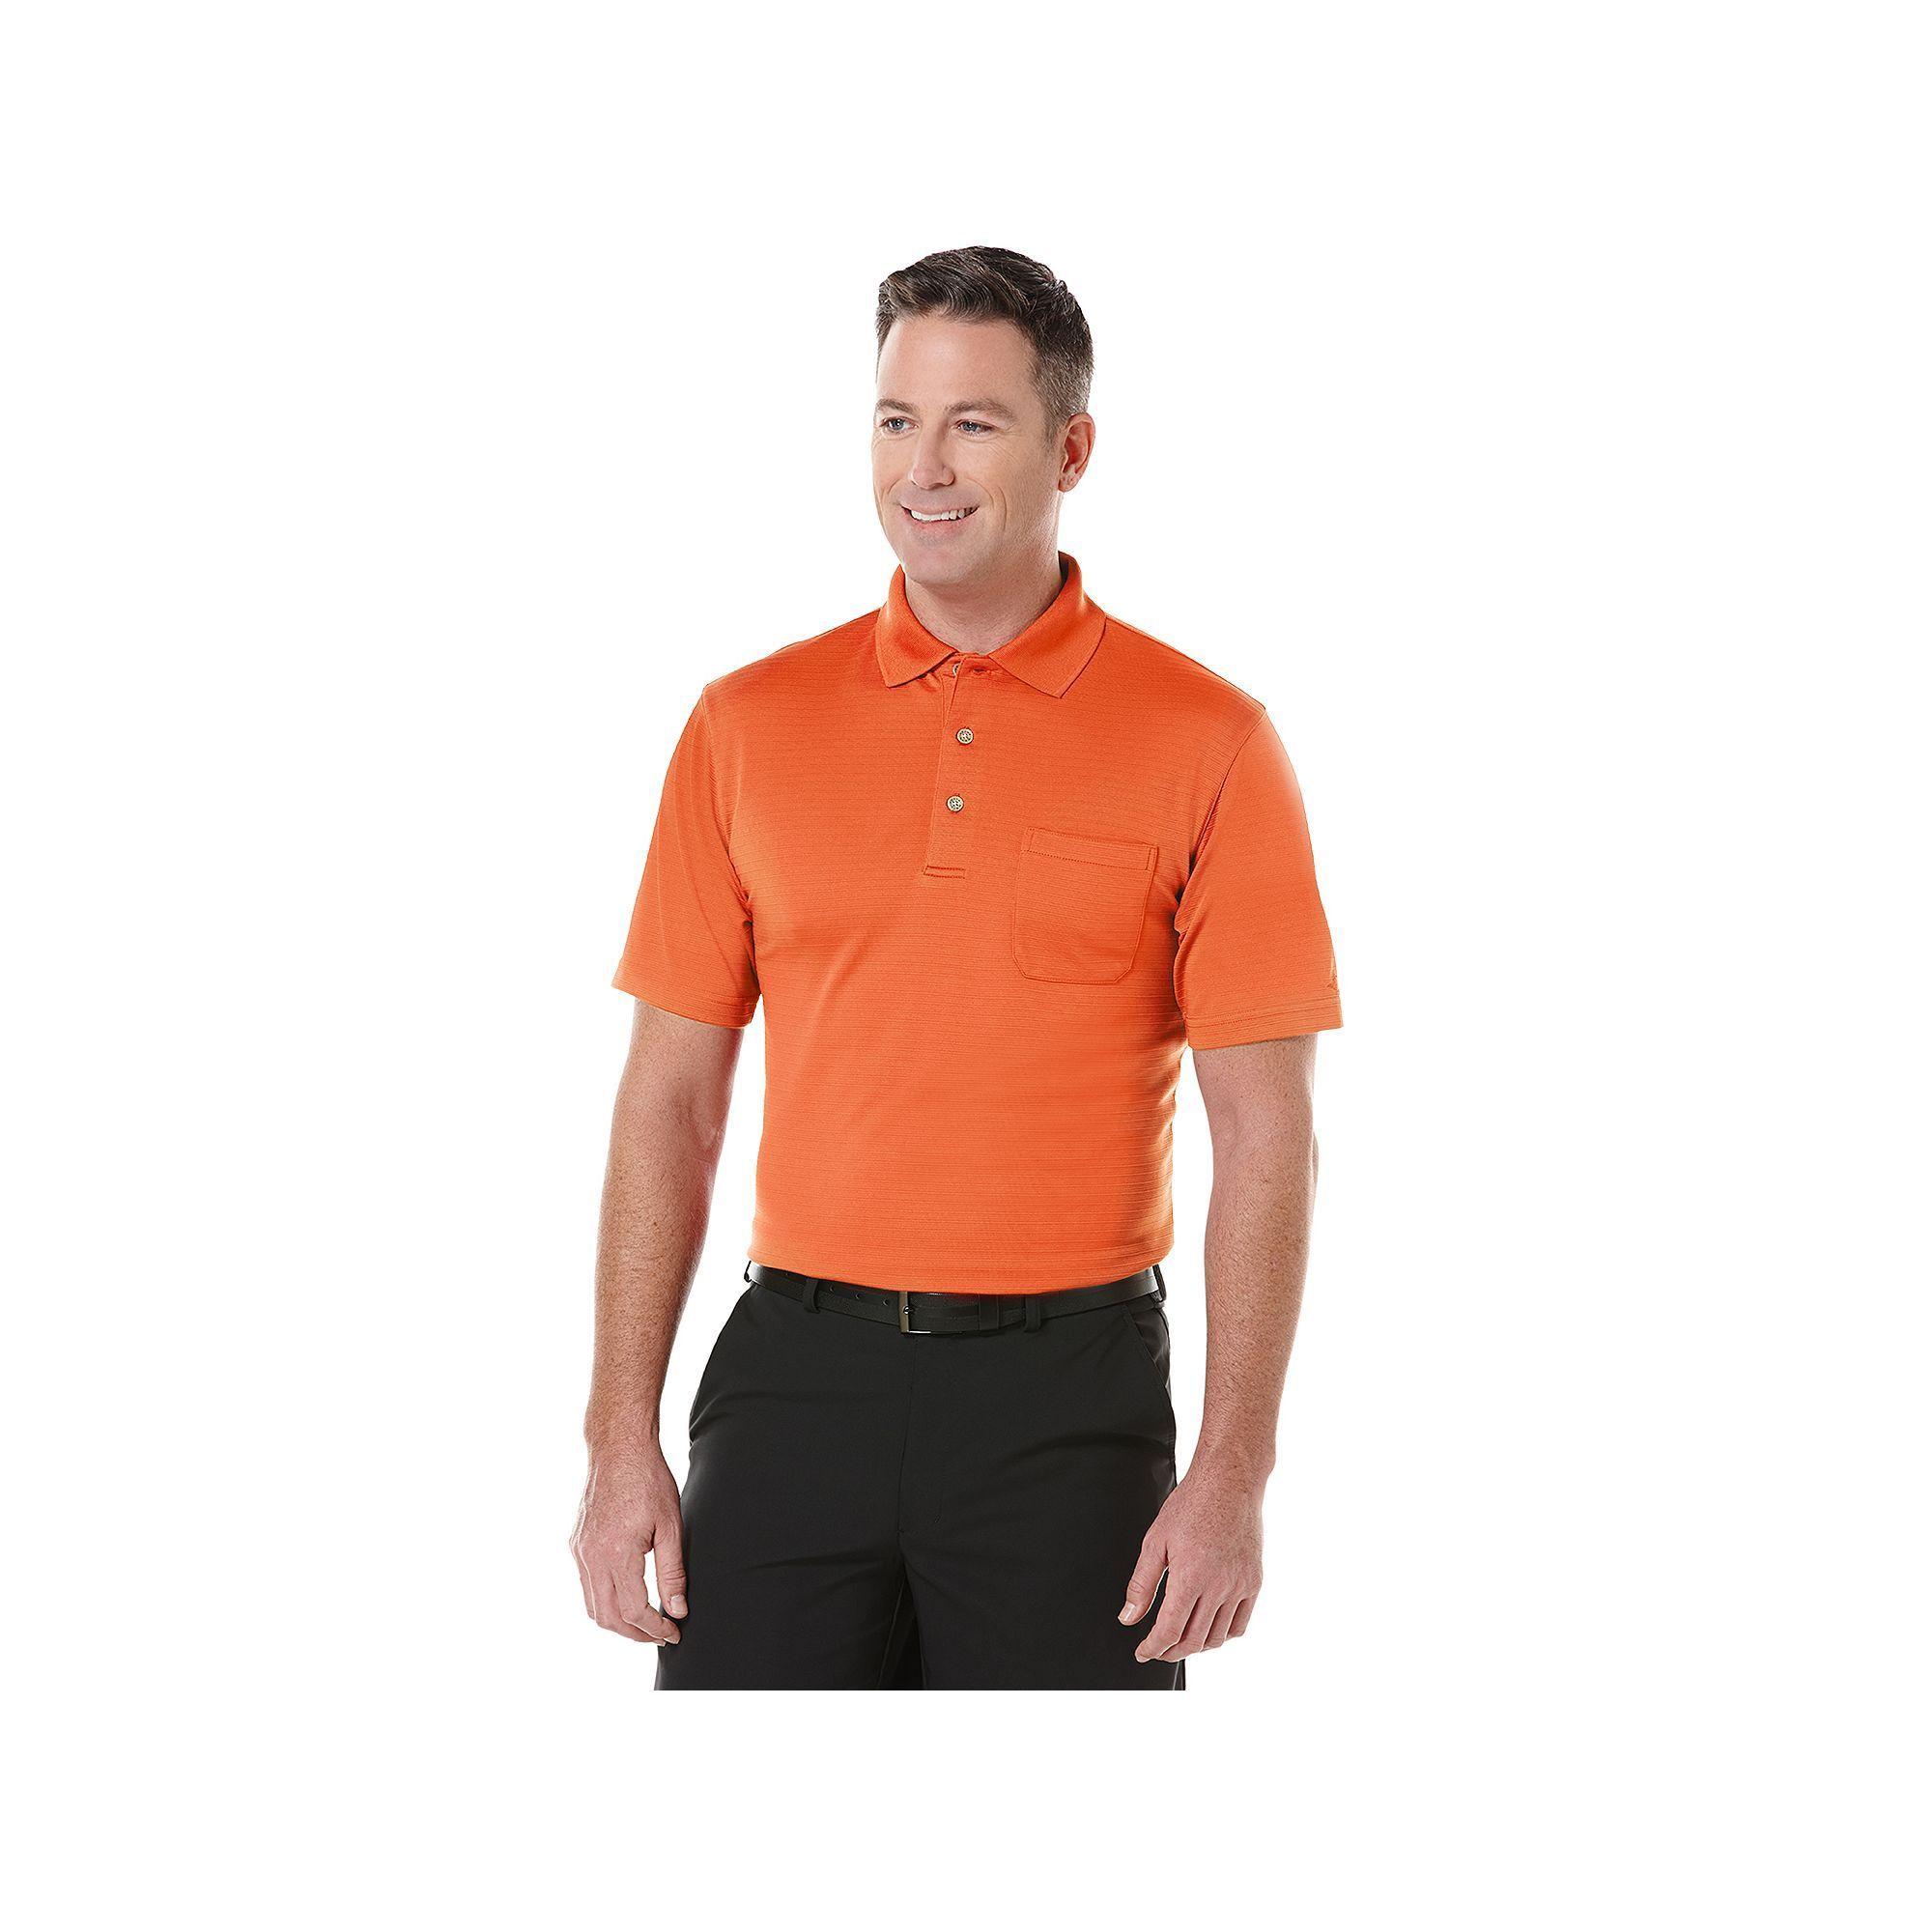 988e4fd89 Big & Tall Grand Slam Airflow Solid Pocketed Performance Golf Polo, Men's,  Size: Xl Tall, Brt Orange